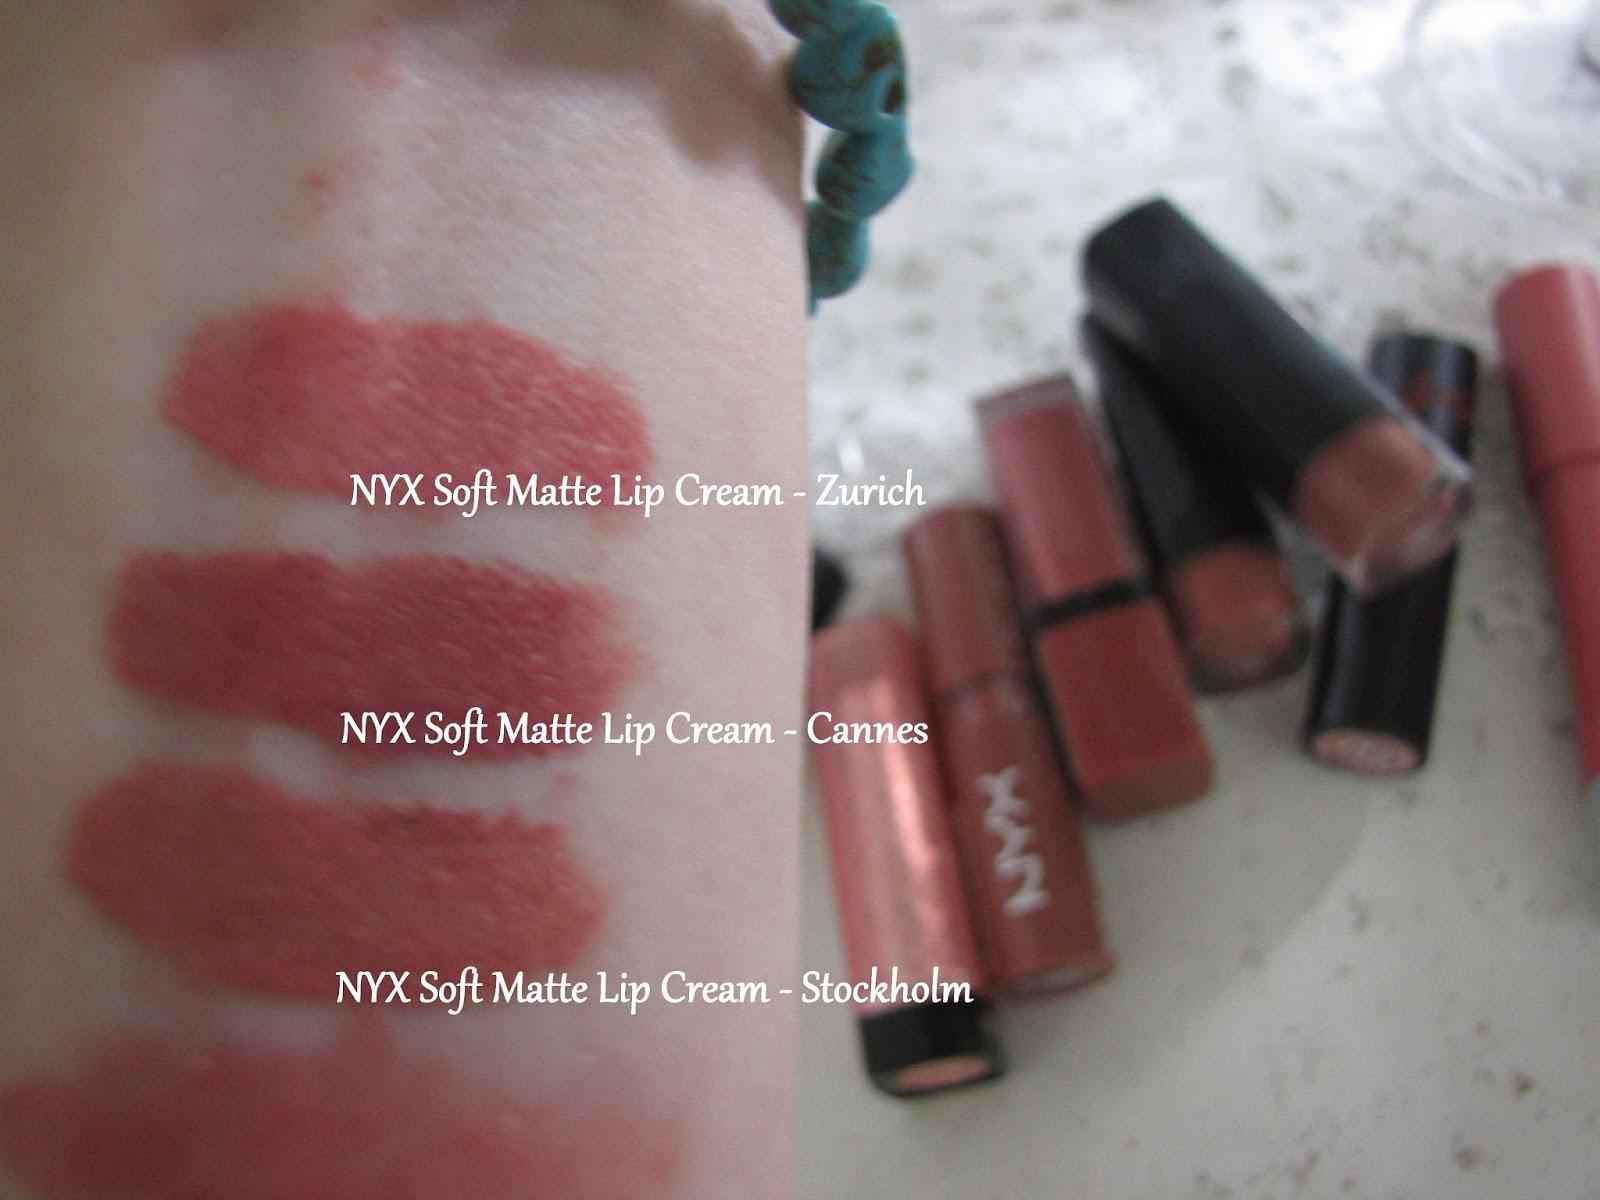 Nyx Soft Matte Lip Cream Stockholm Swatch | Ownerlip.co